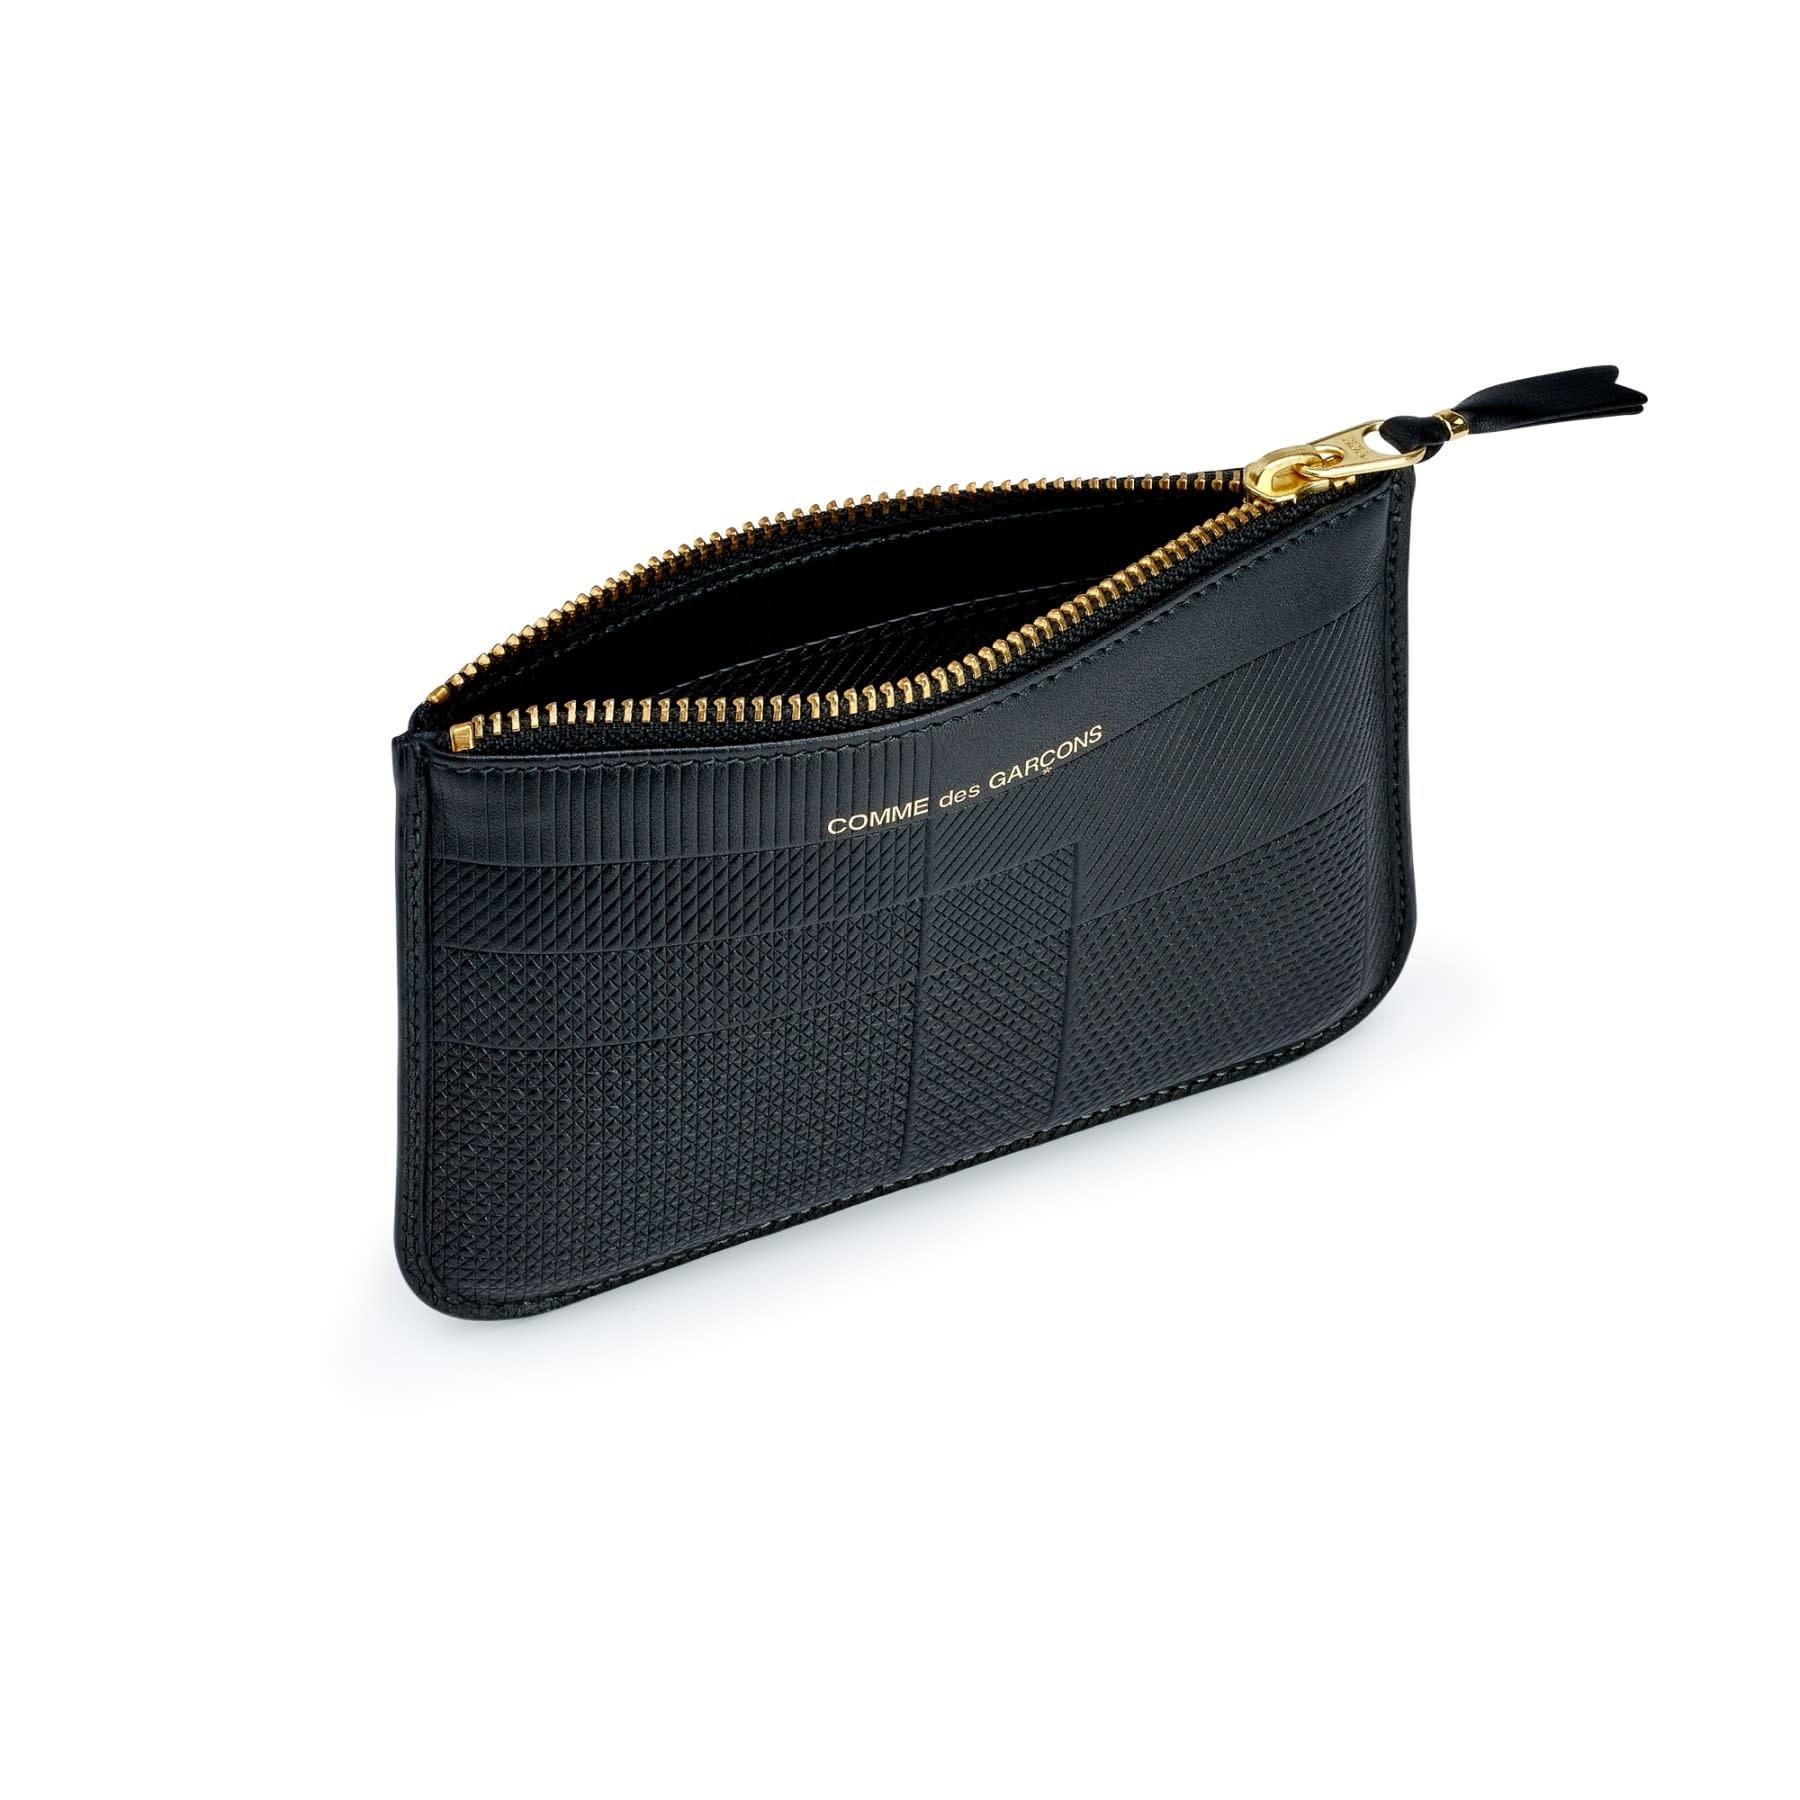 COMME des GARÇONS WALLET Intersection Lines Small Zip Pouch Black SA8100LS